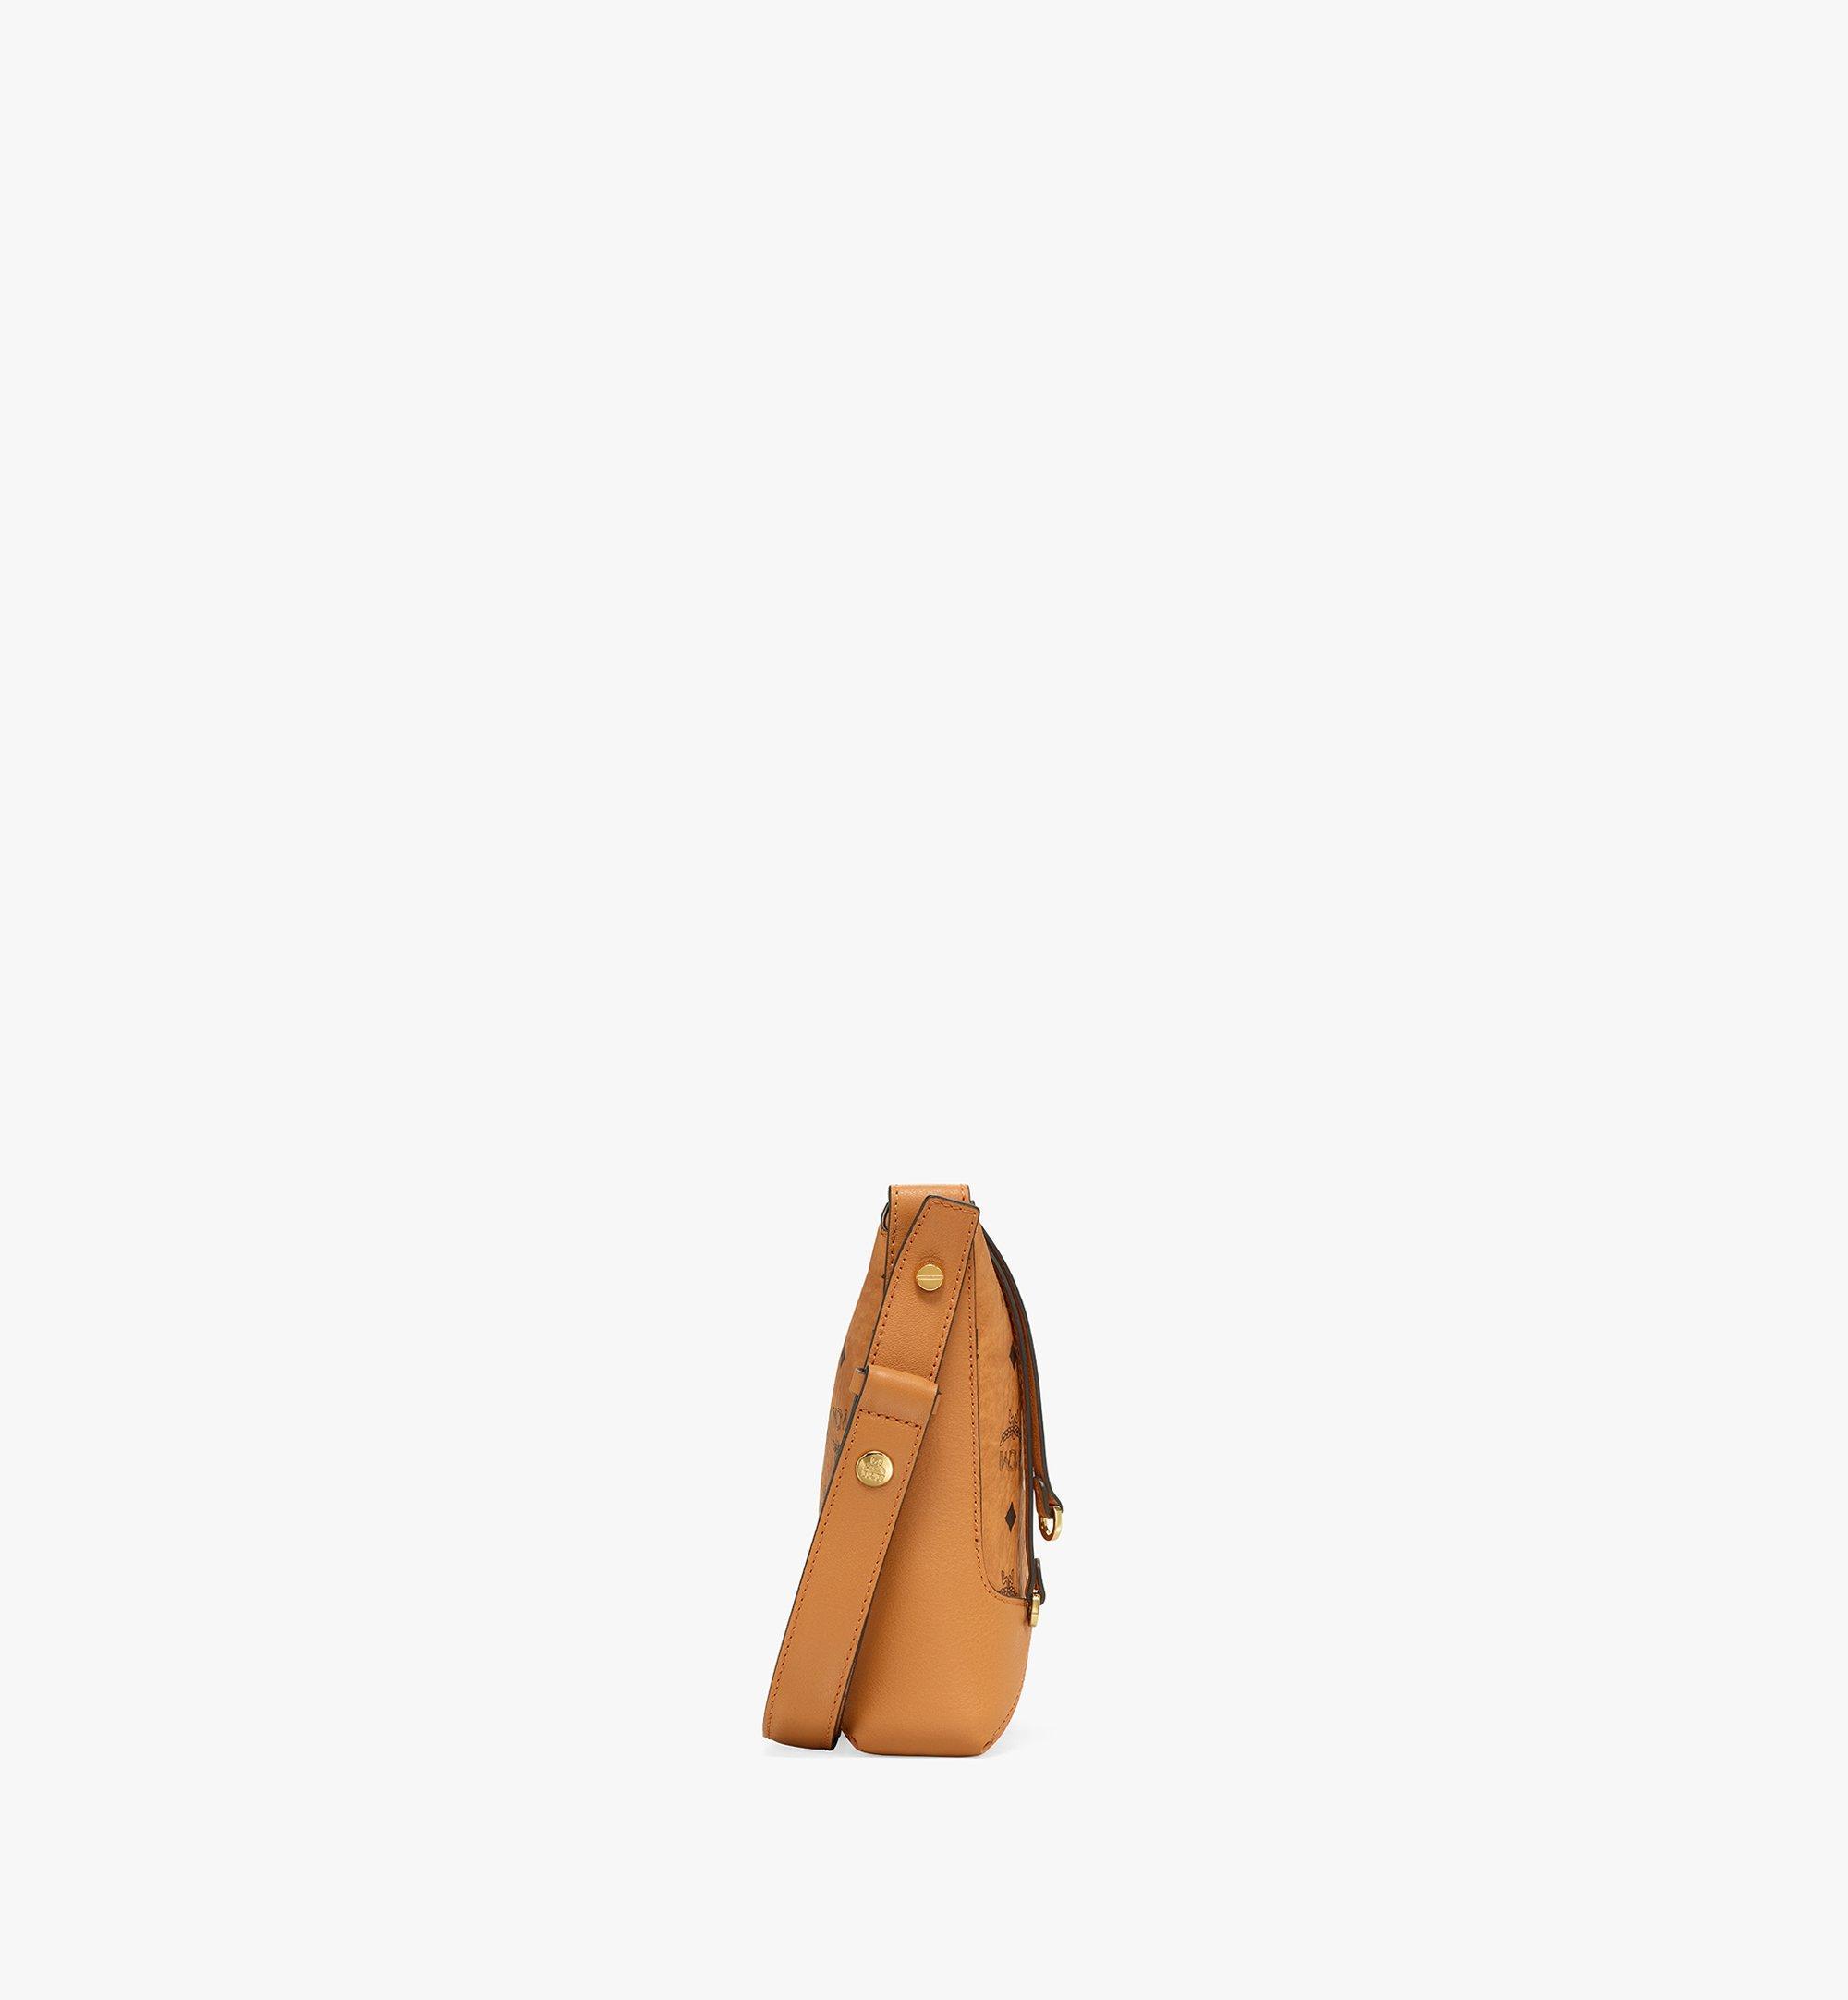 MCM Klara Shoulder Bag in Visetos Cognac MWSBSKM01CO001 Alternate View 1